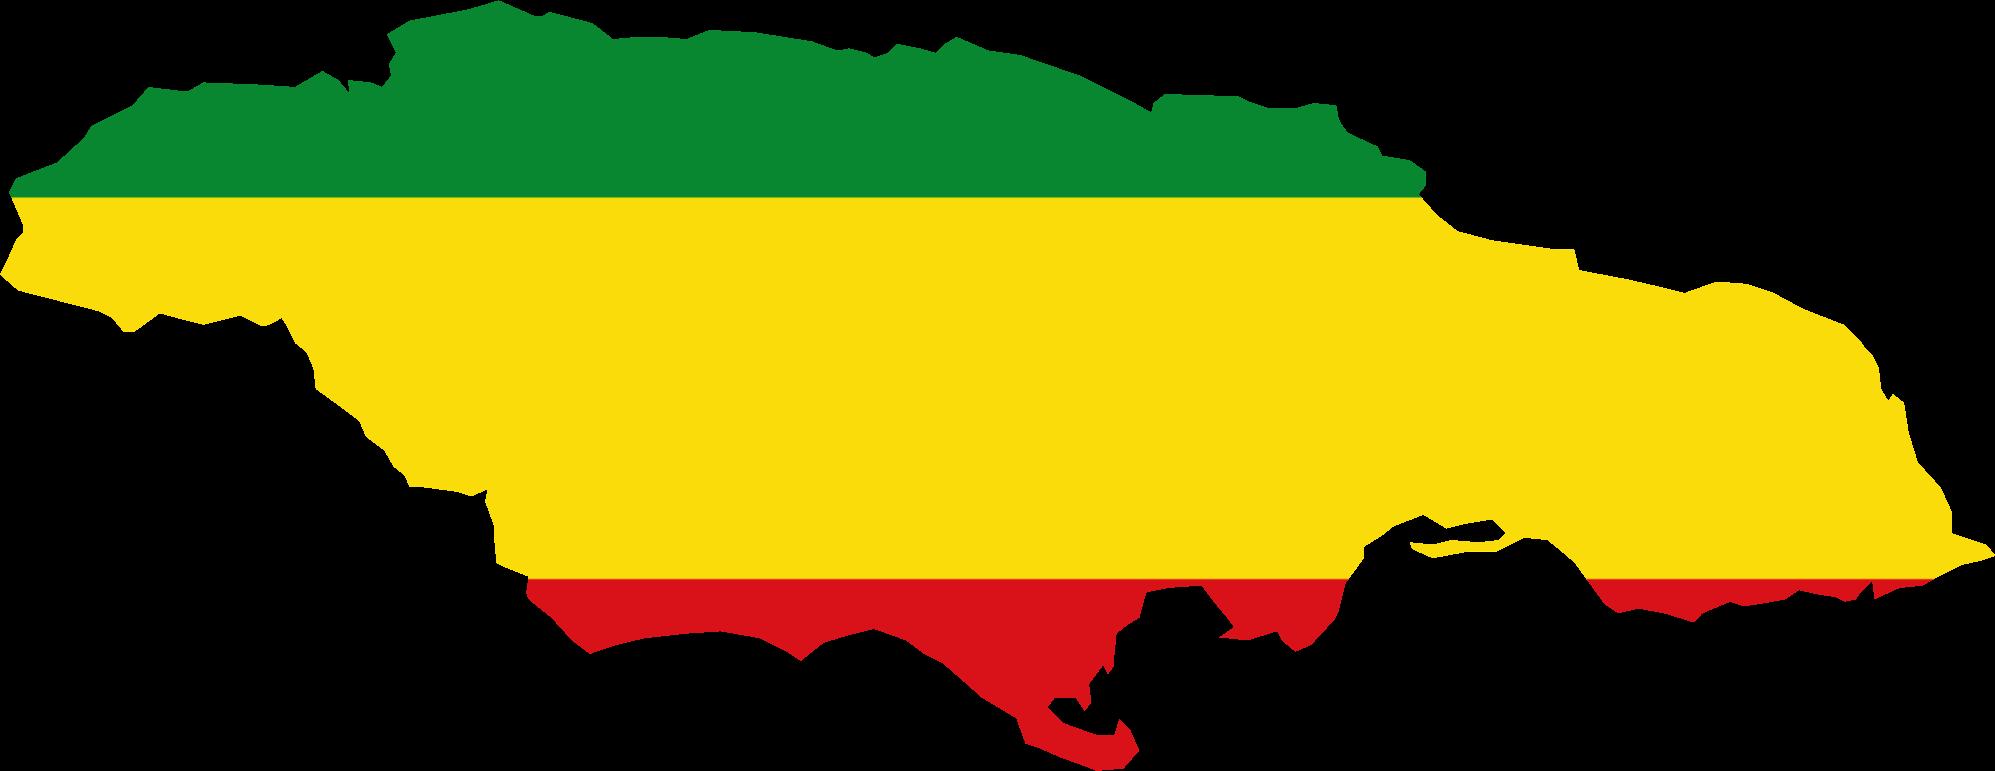 wiki laws jamaica